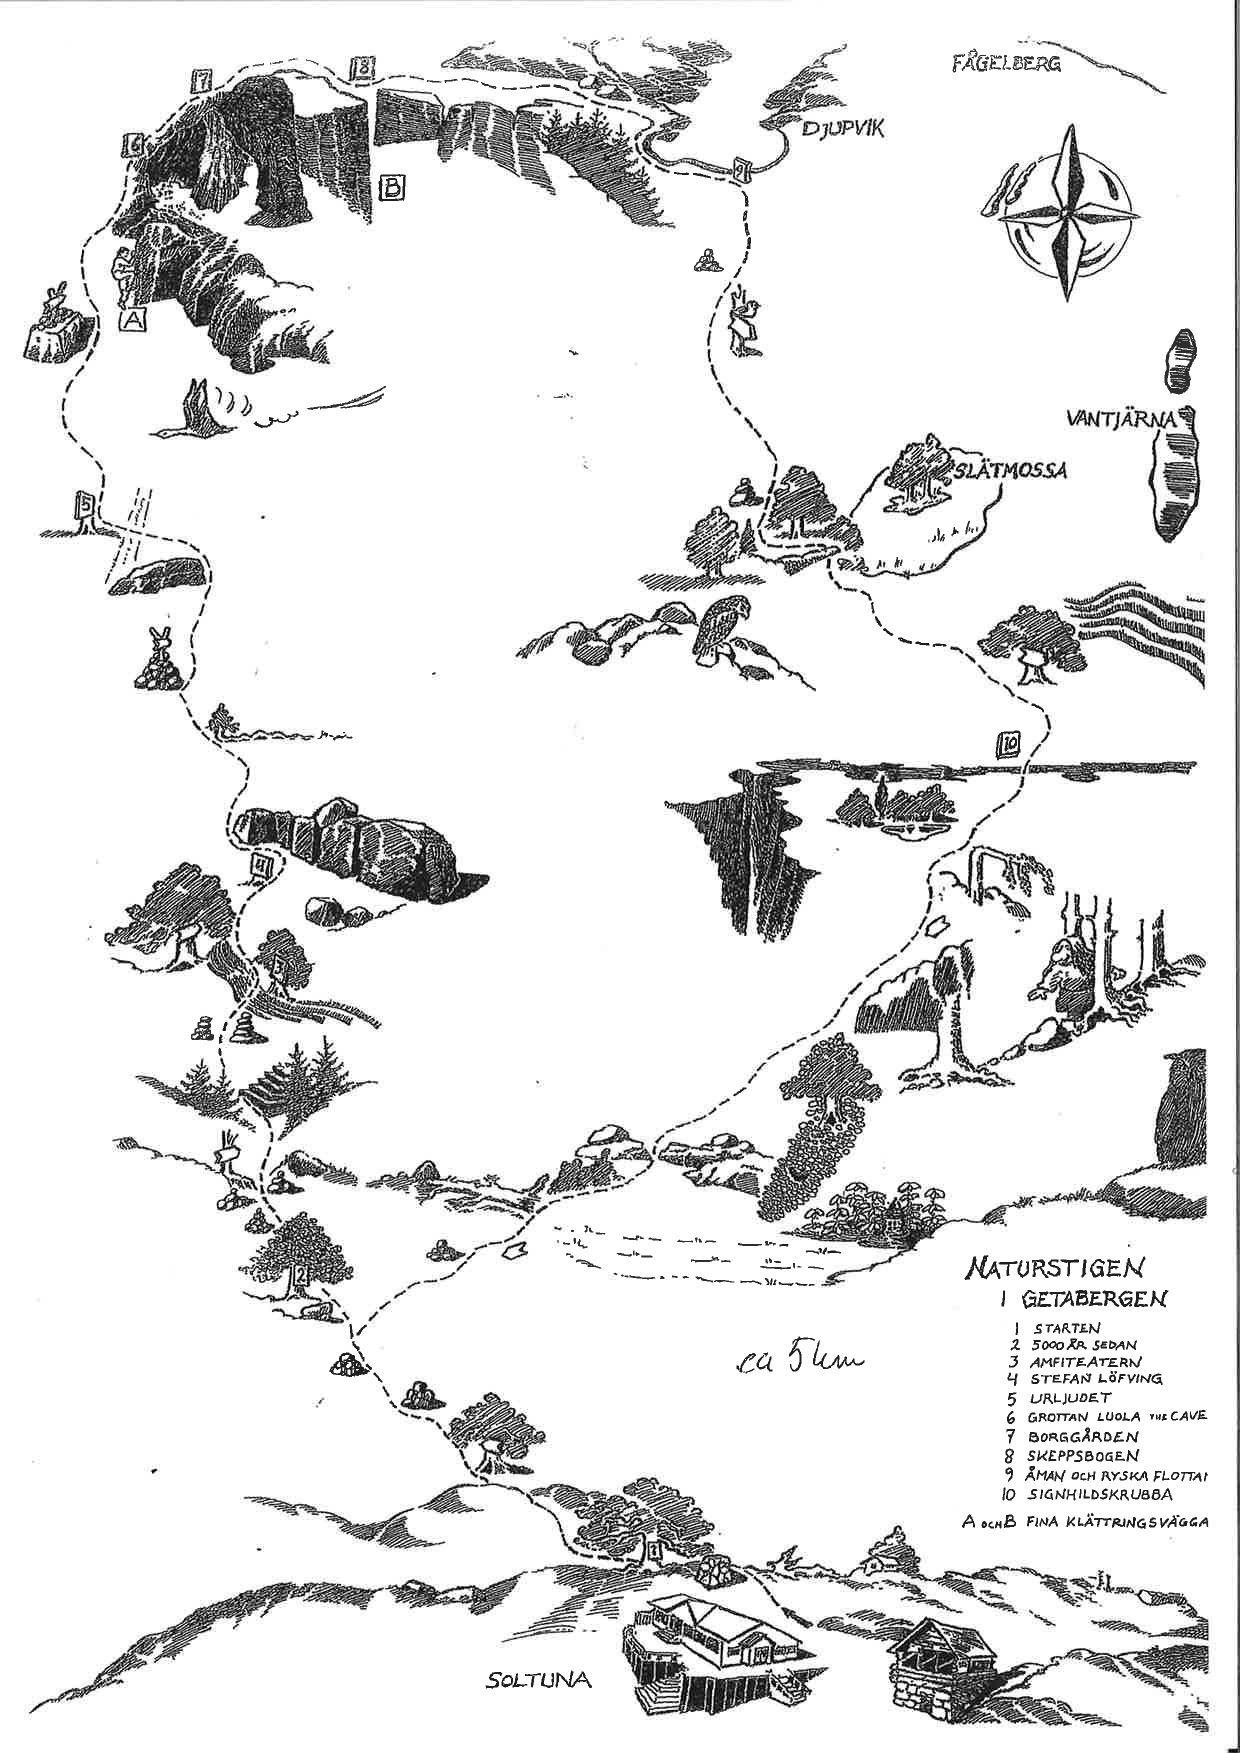 Grottstigen – Naturstigen i Getabergen